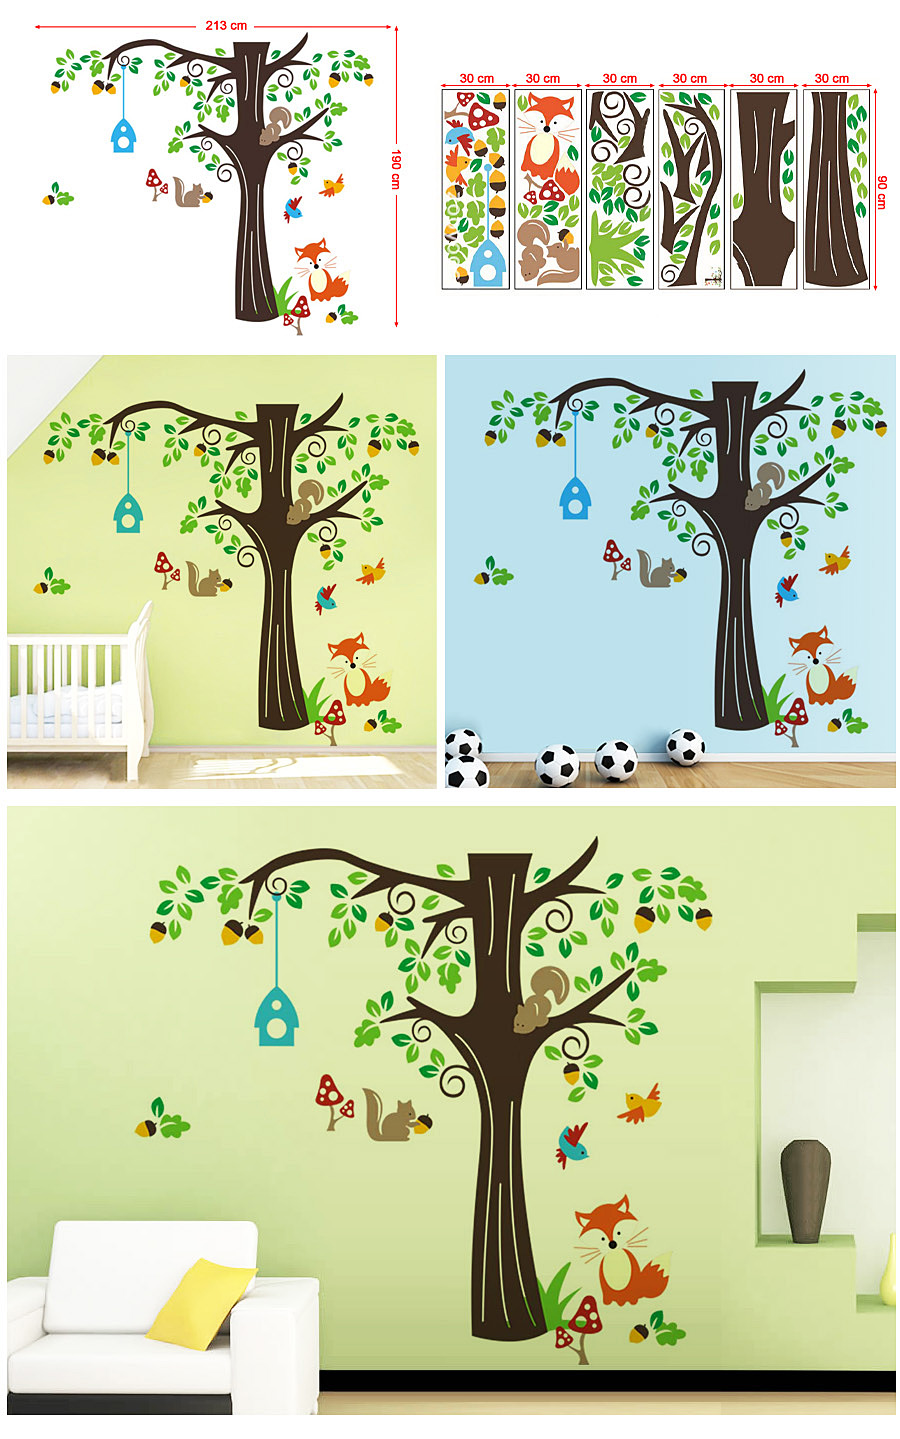 songmics cartoon waldtiere kinderzimmer wandaufkleber wandtattoo baum fwt04c. Black Bedroom Furniture Sets. Home Design Ideas